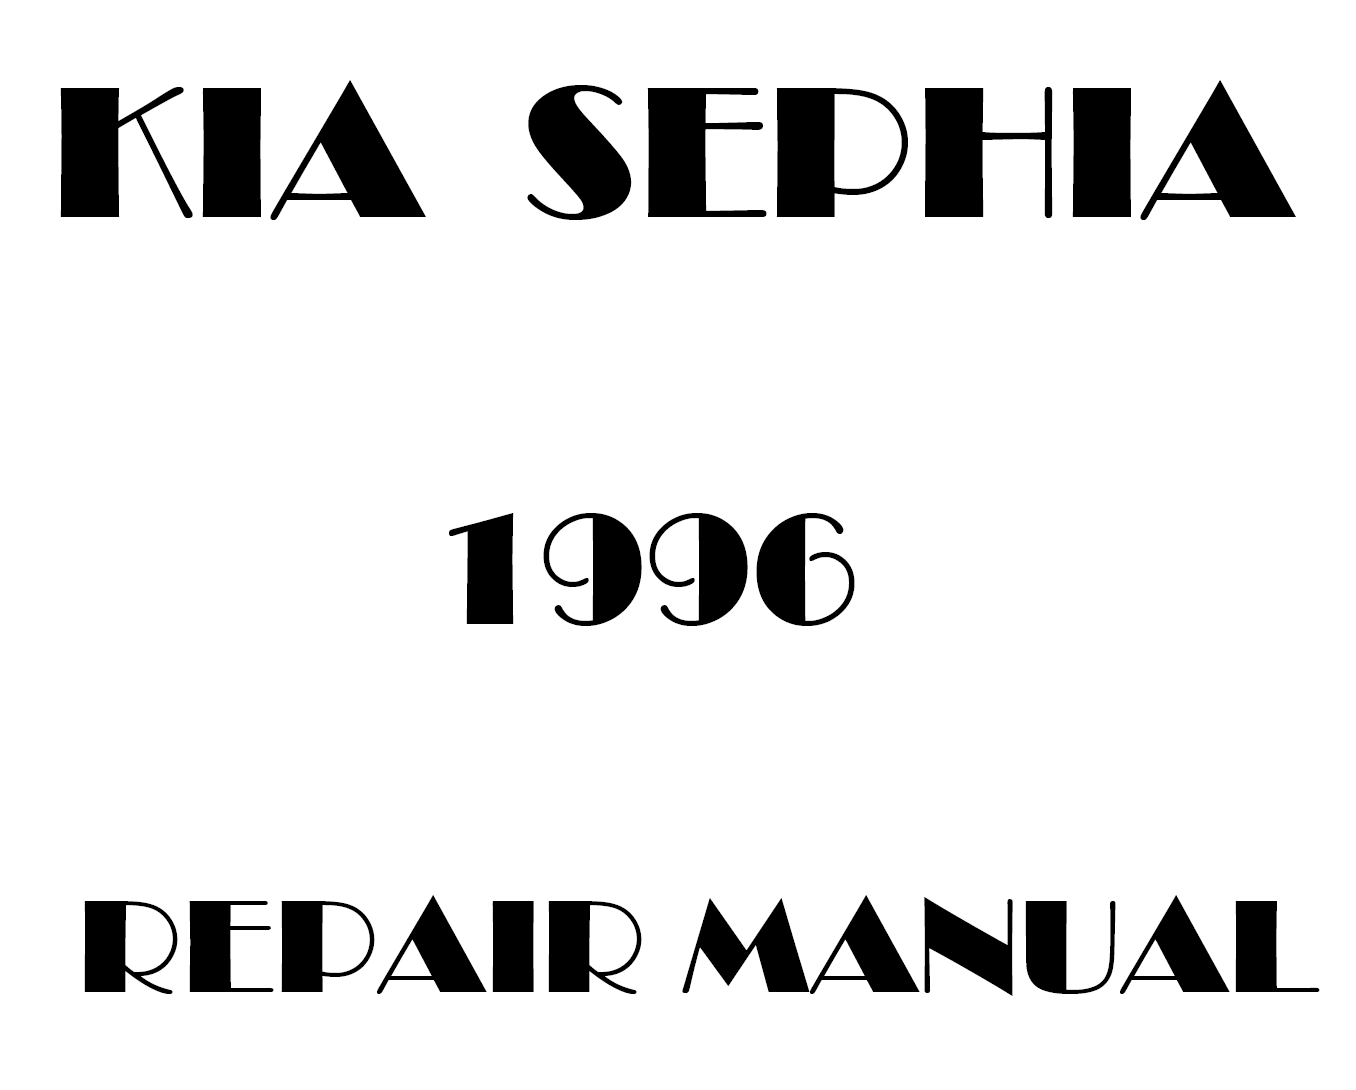 1996 Kia Sephia repair manual